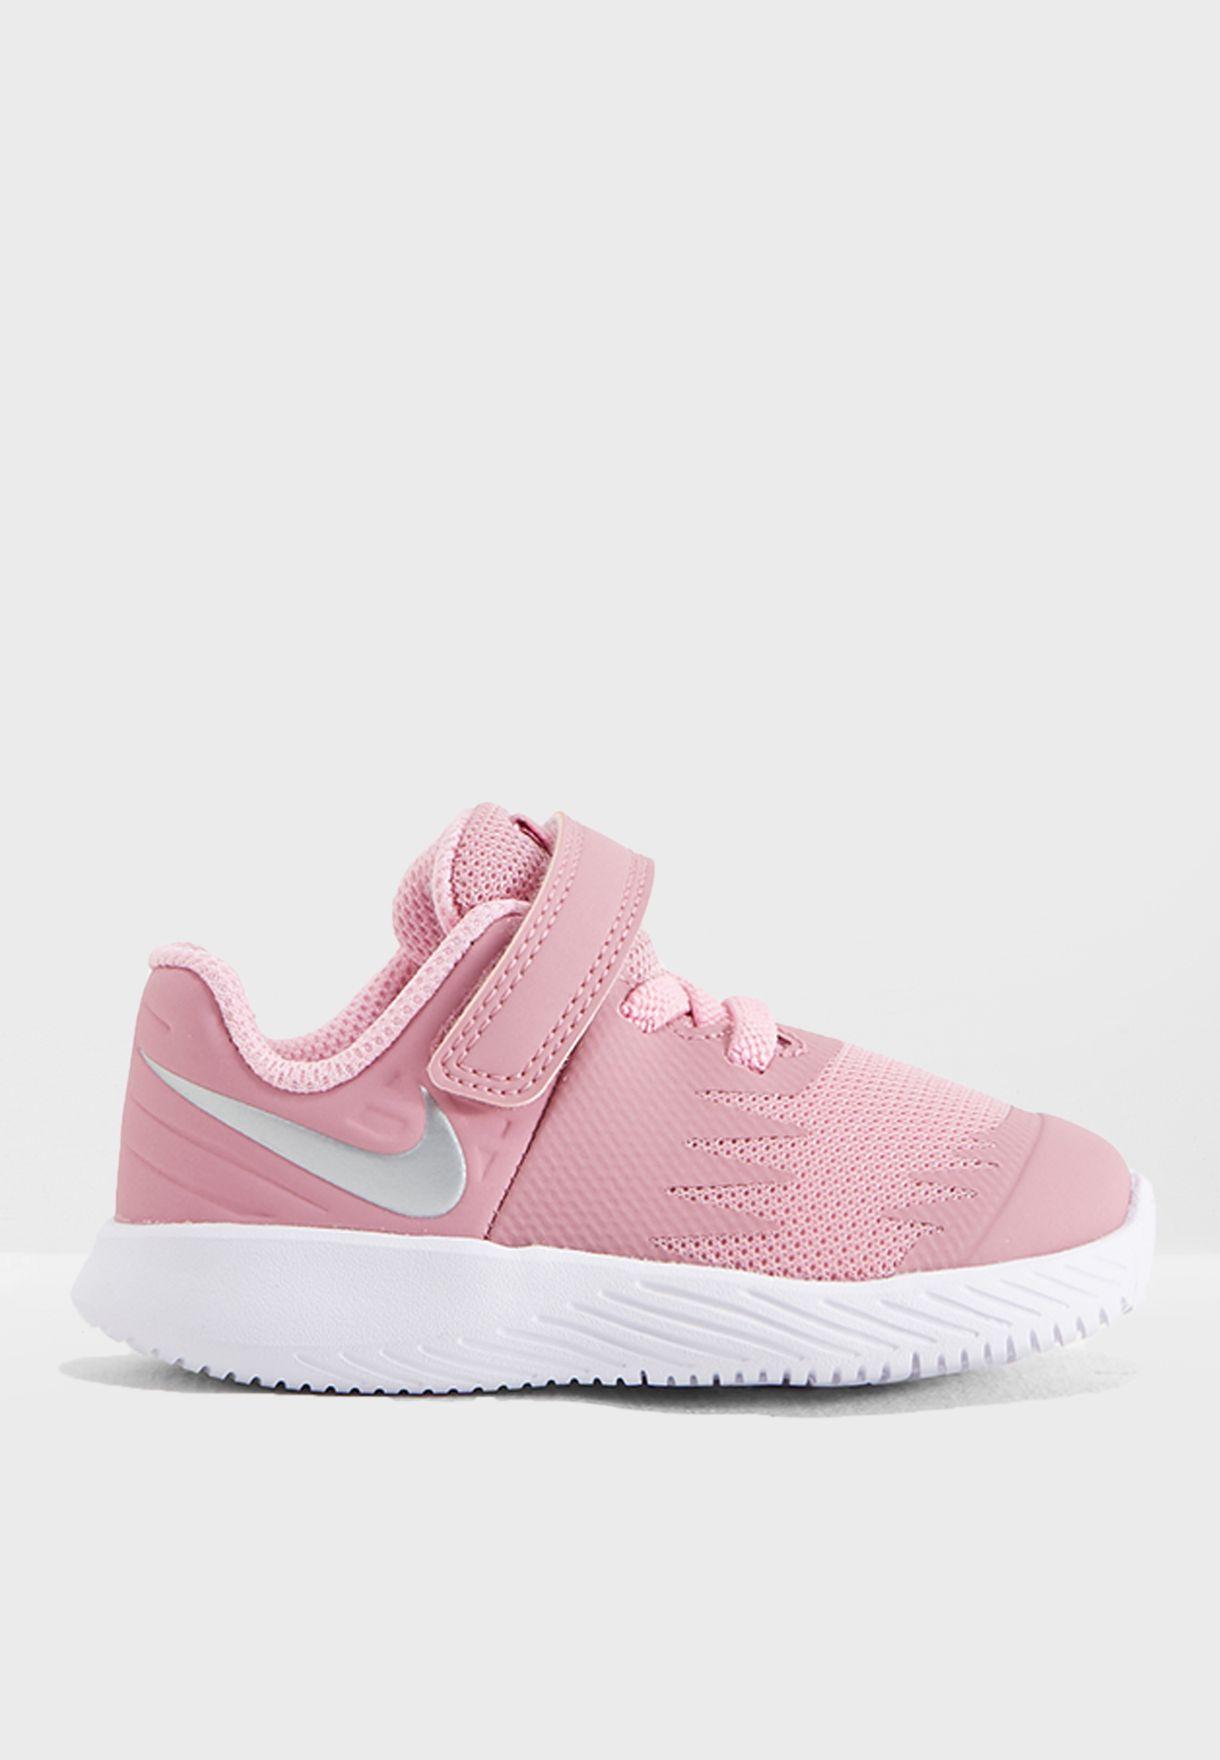 Funeral semilla aceptable  Buy Nike pink Infant Star Runner for Kids in MENA, Worldwide | 907256-601